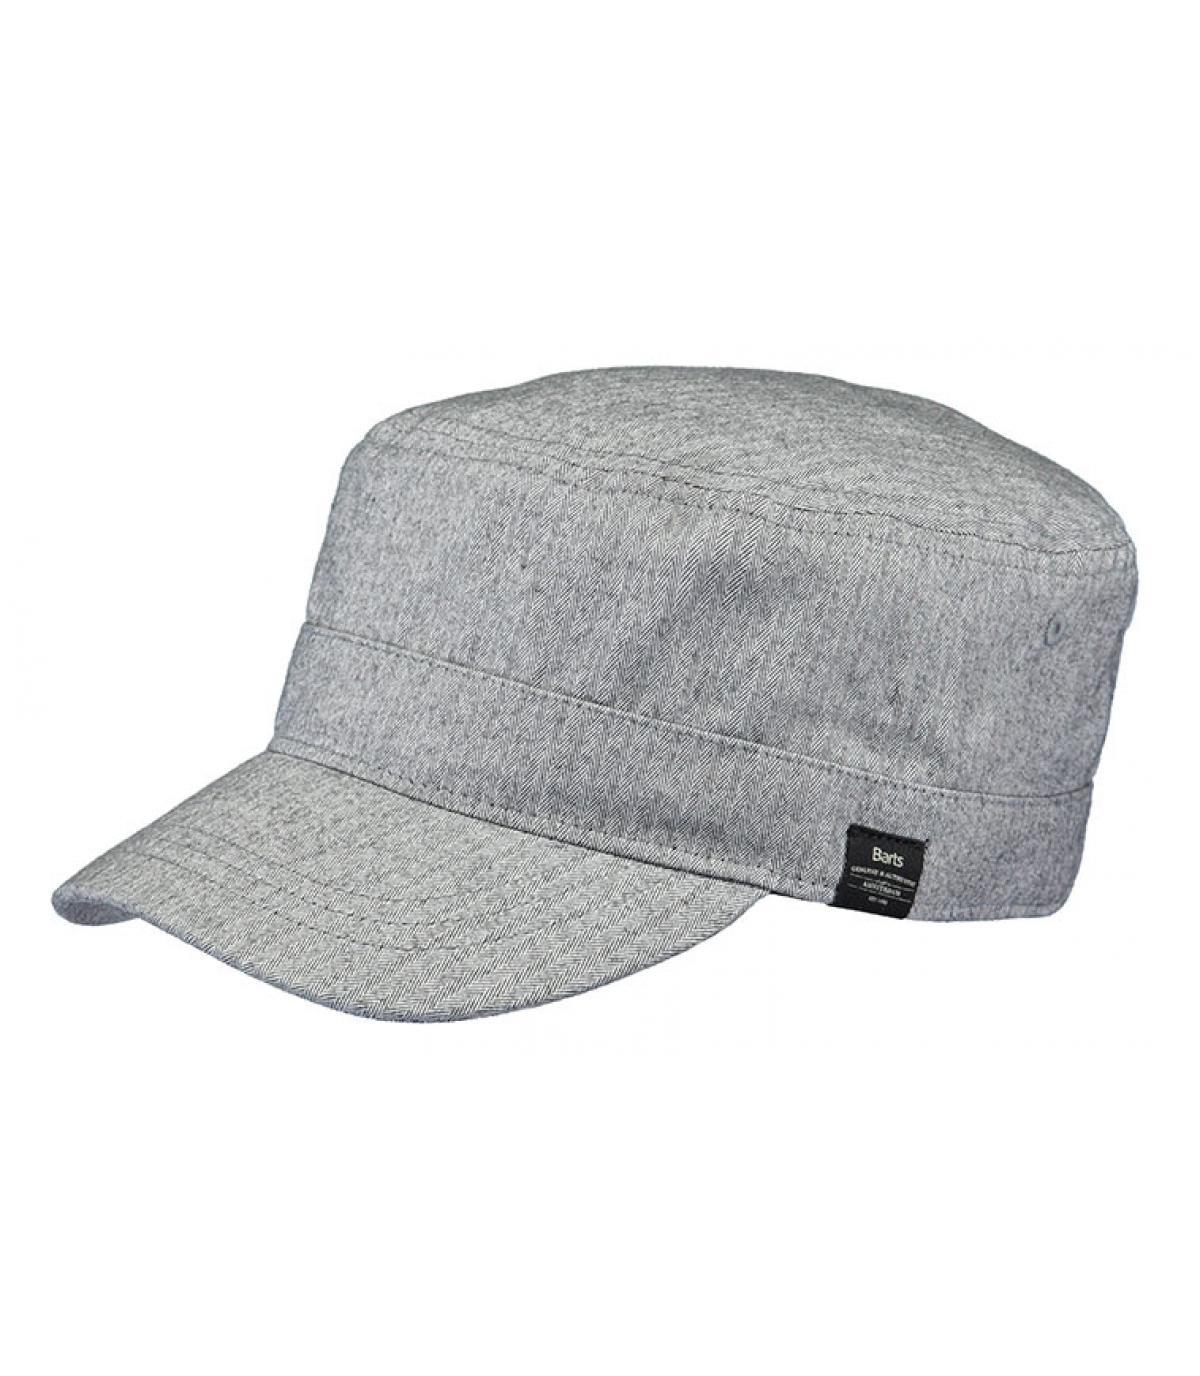 casquette army gris